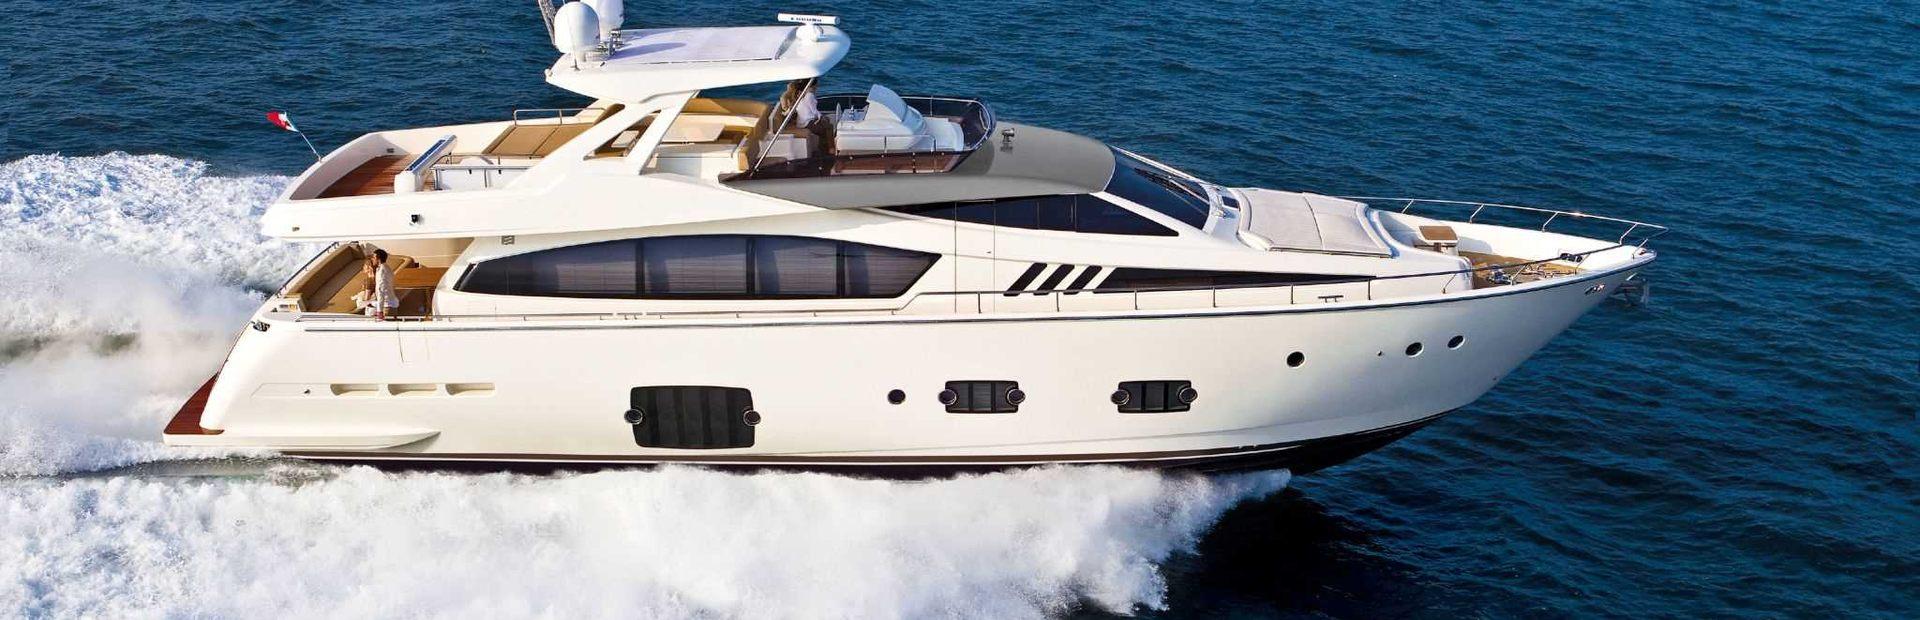 Ferretti 800 Yacht Charter